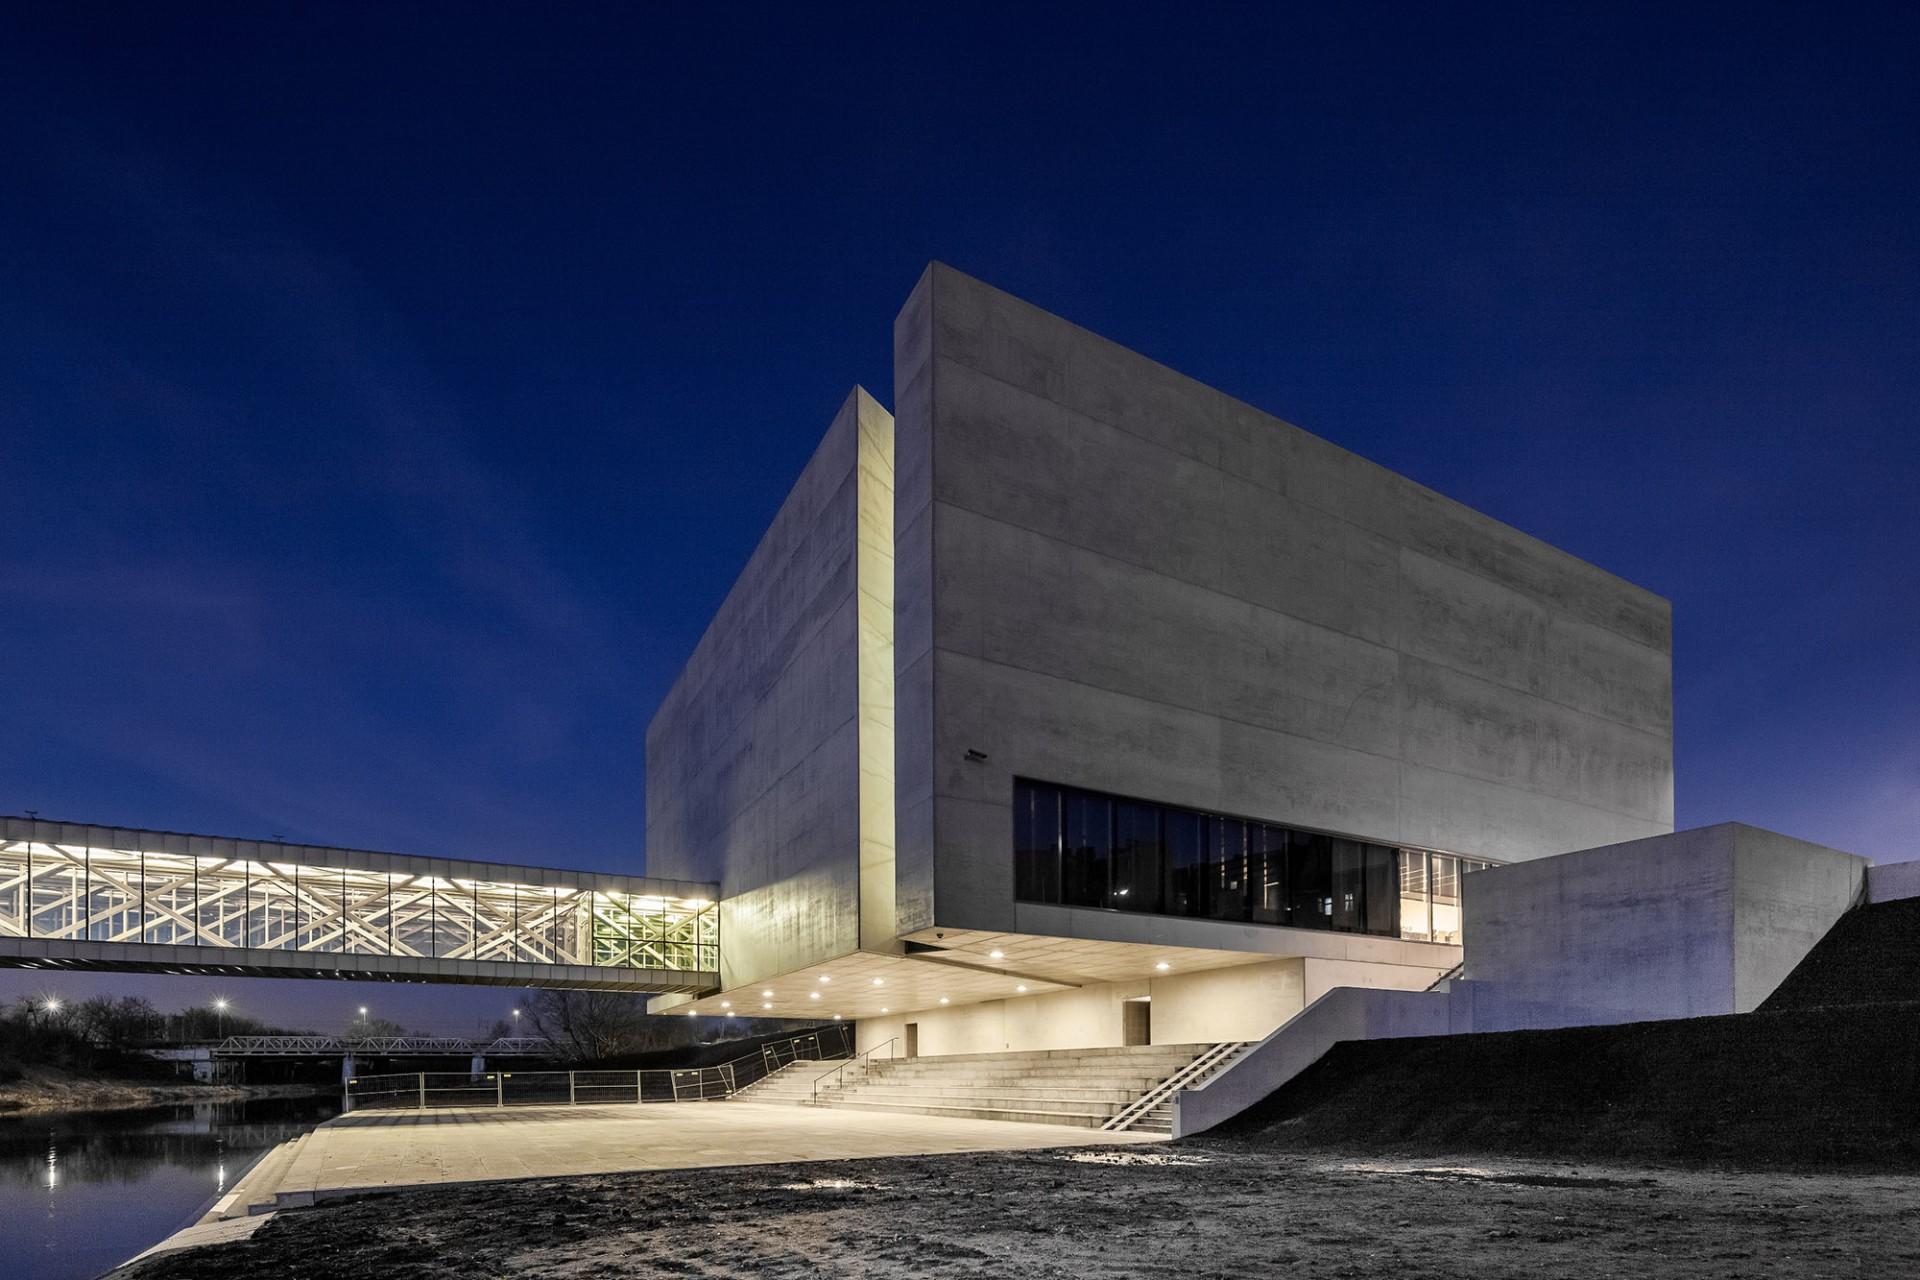 Interaktywne Centrum Historii Ostrowa Tumskiego ICHOT